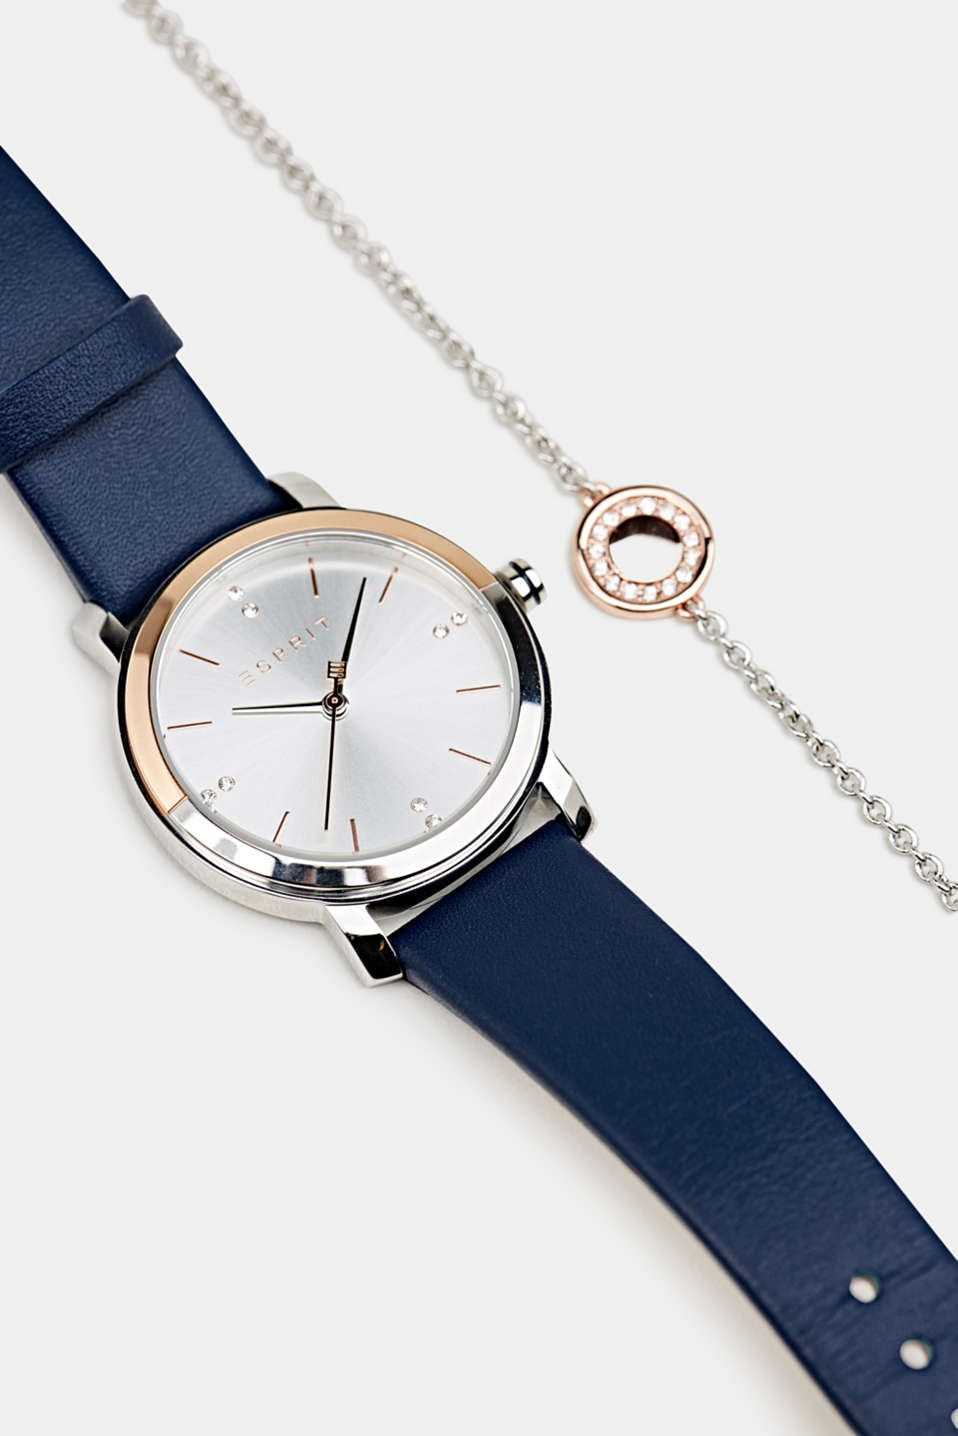 Watch and bracelet set, LCBLUE, detail image number 5